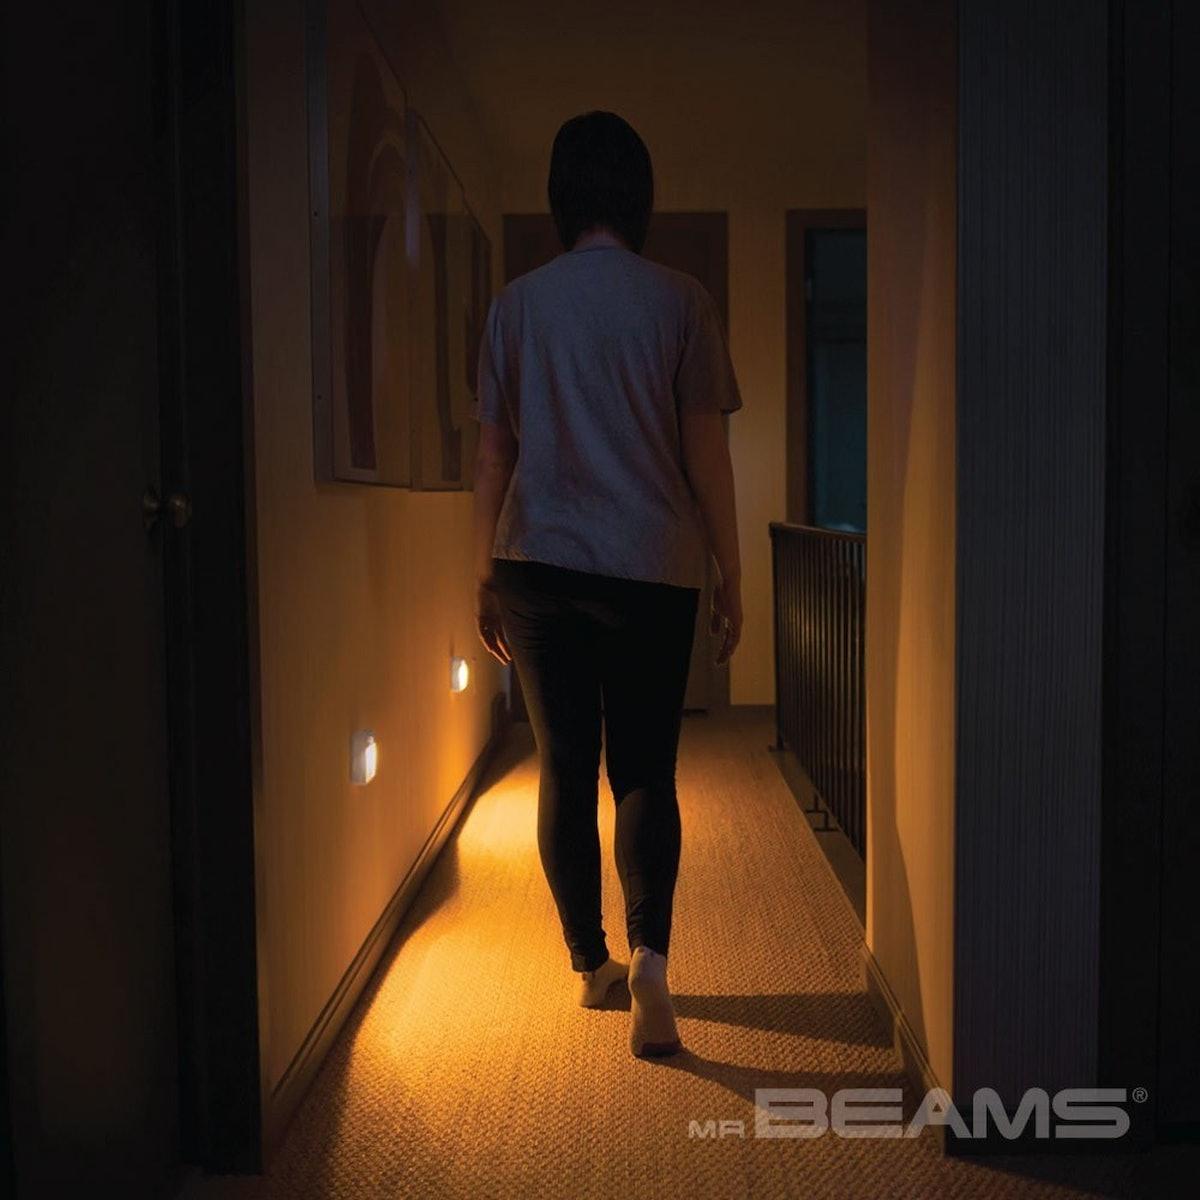 Mr. Beams Motion-Sensing Stick-Anywhere LED Night Light